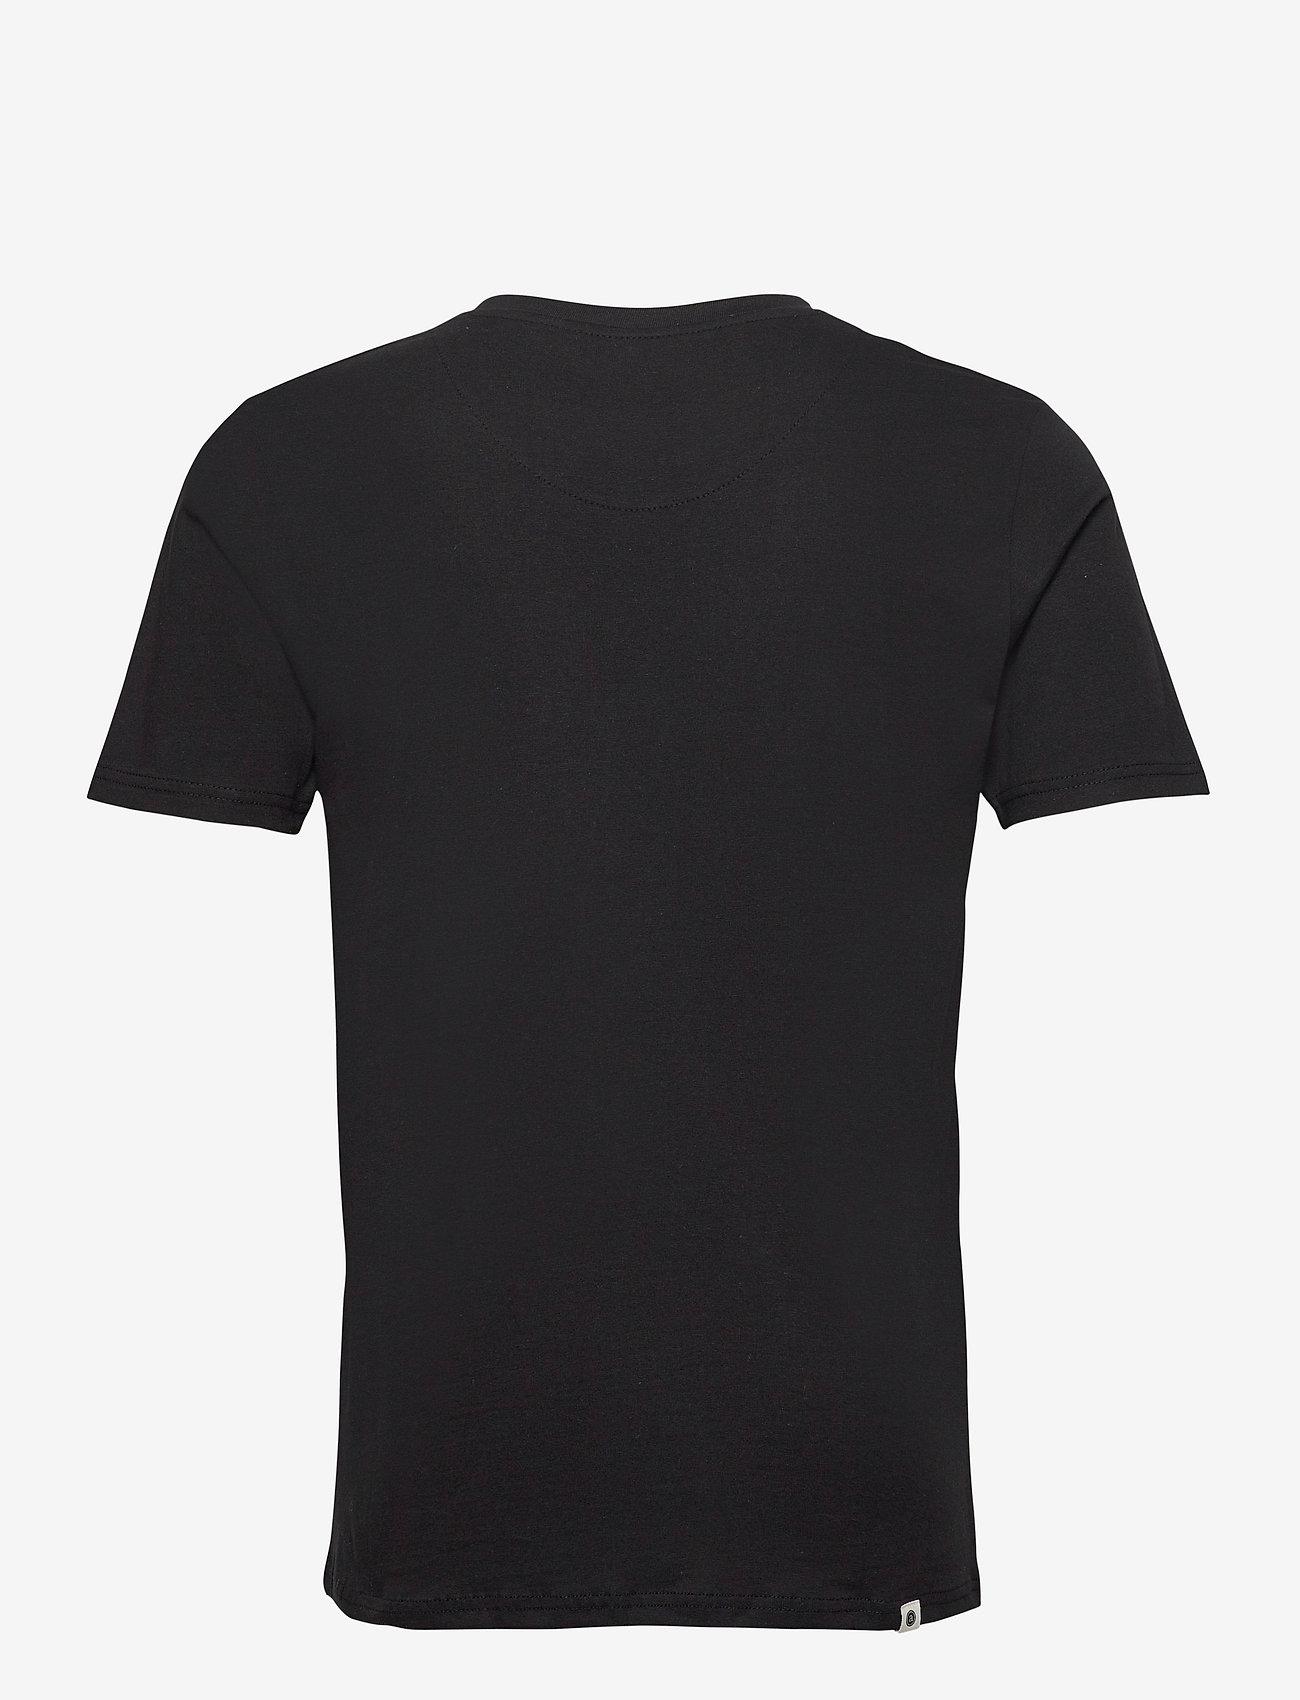 Anerkjendt - AKROD EMBROIDERY TEE - t-shirts - caviar - 1